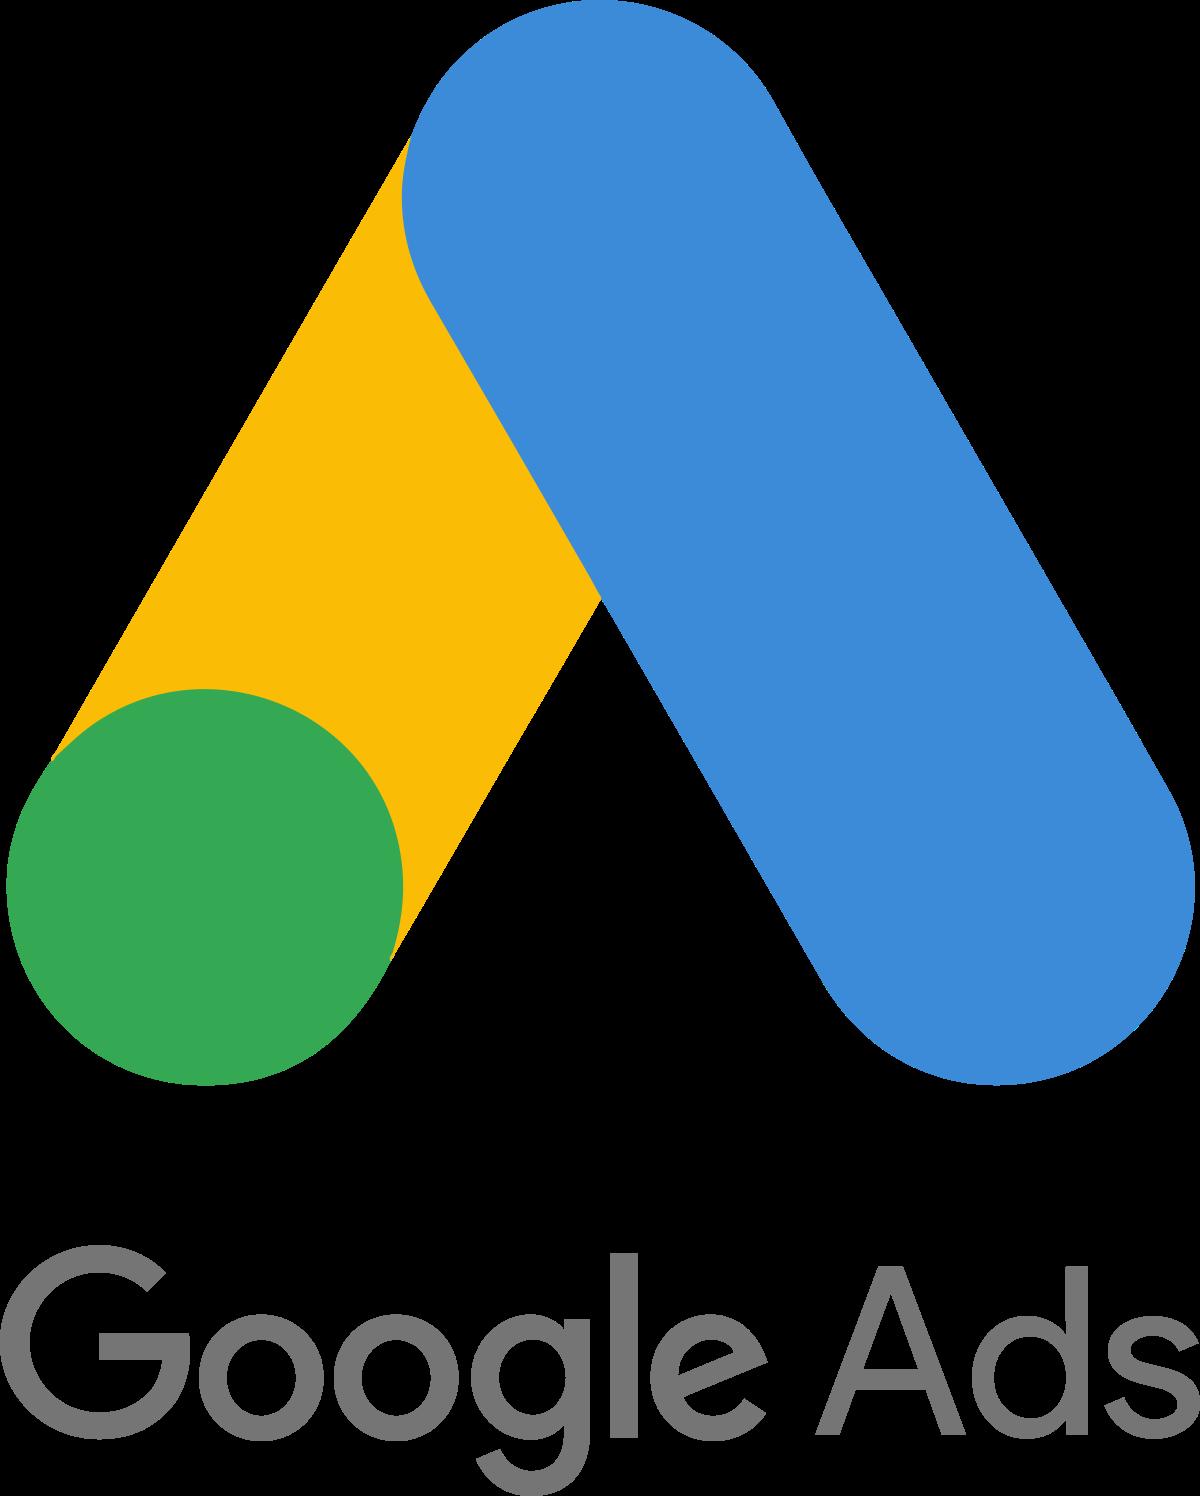 Wikipedia . Google adwords png